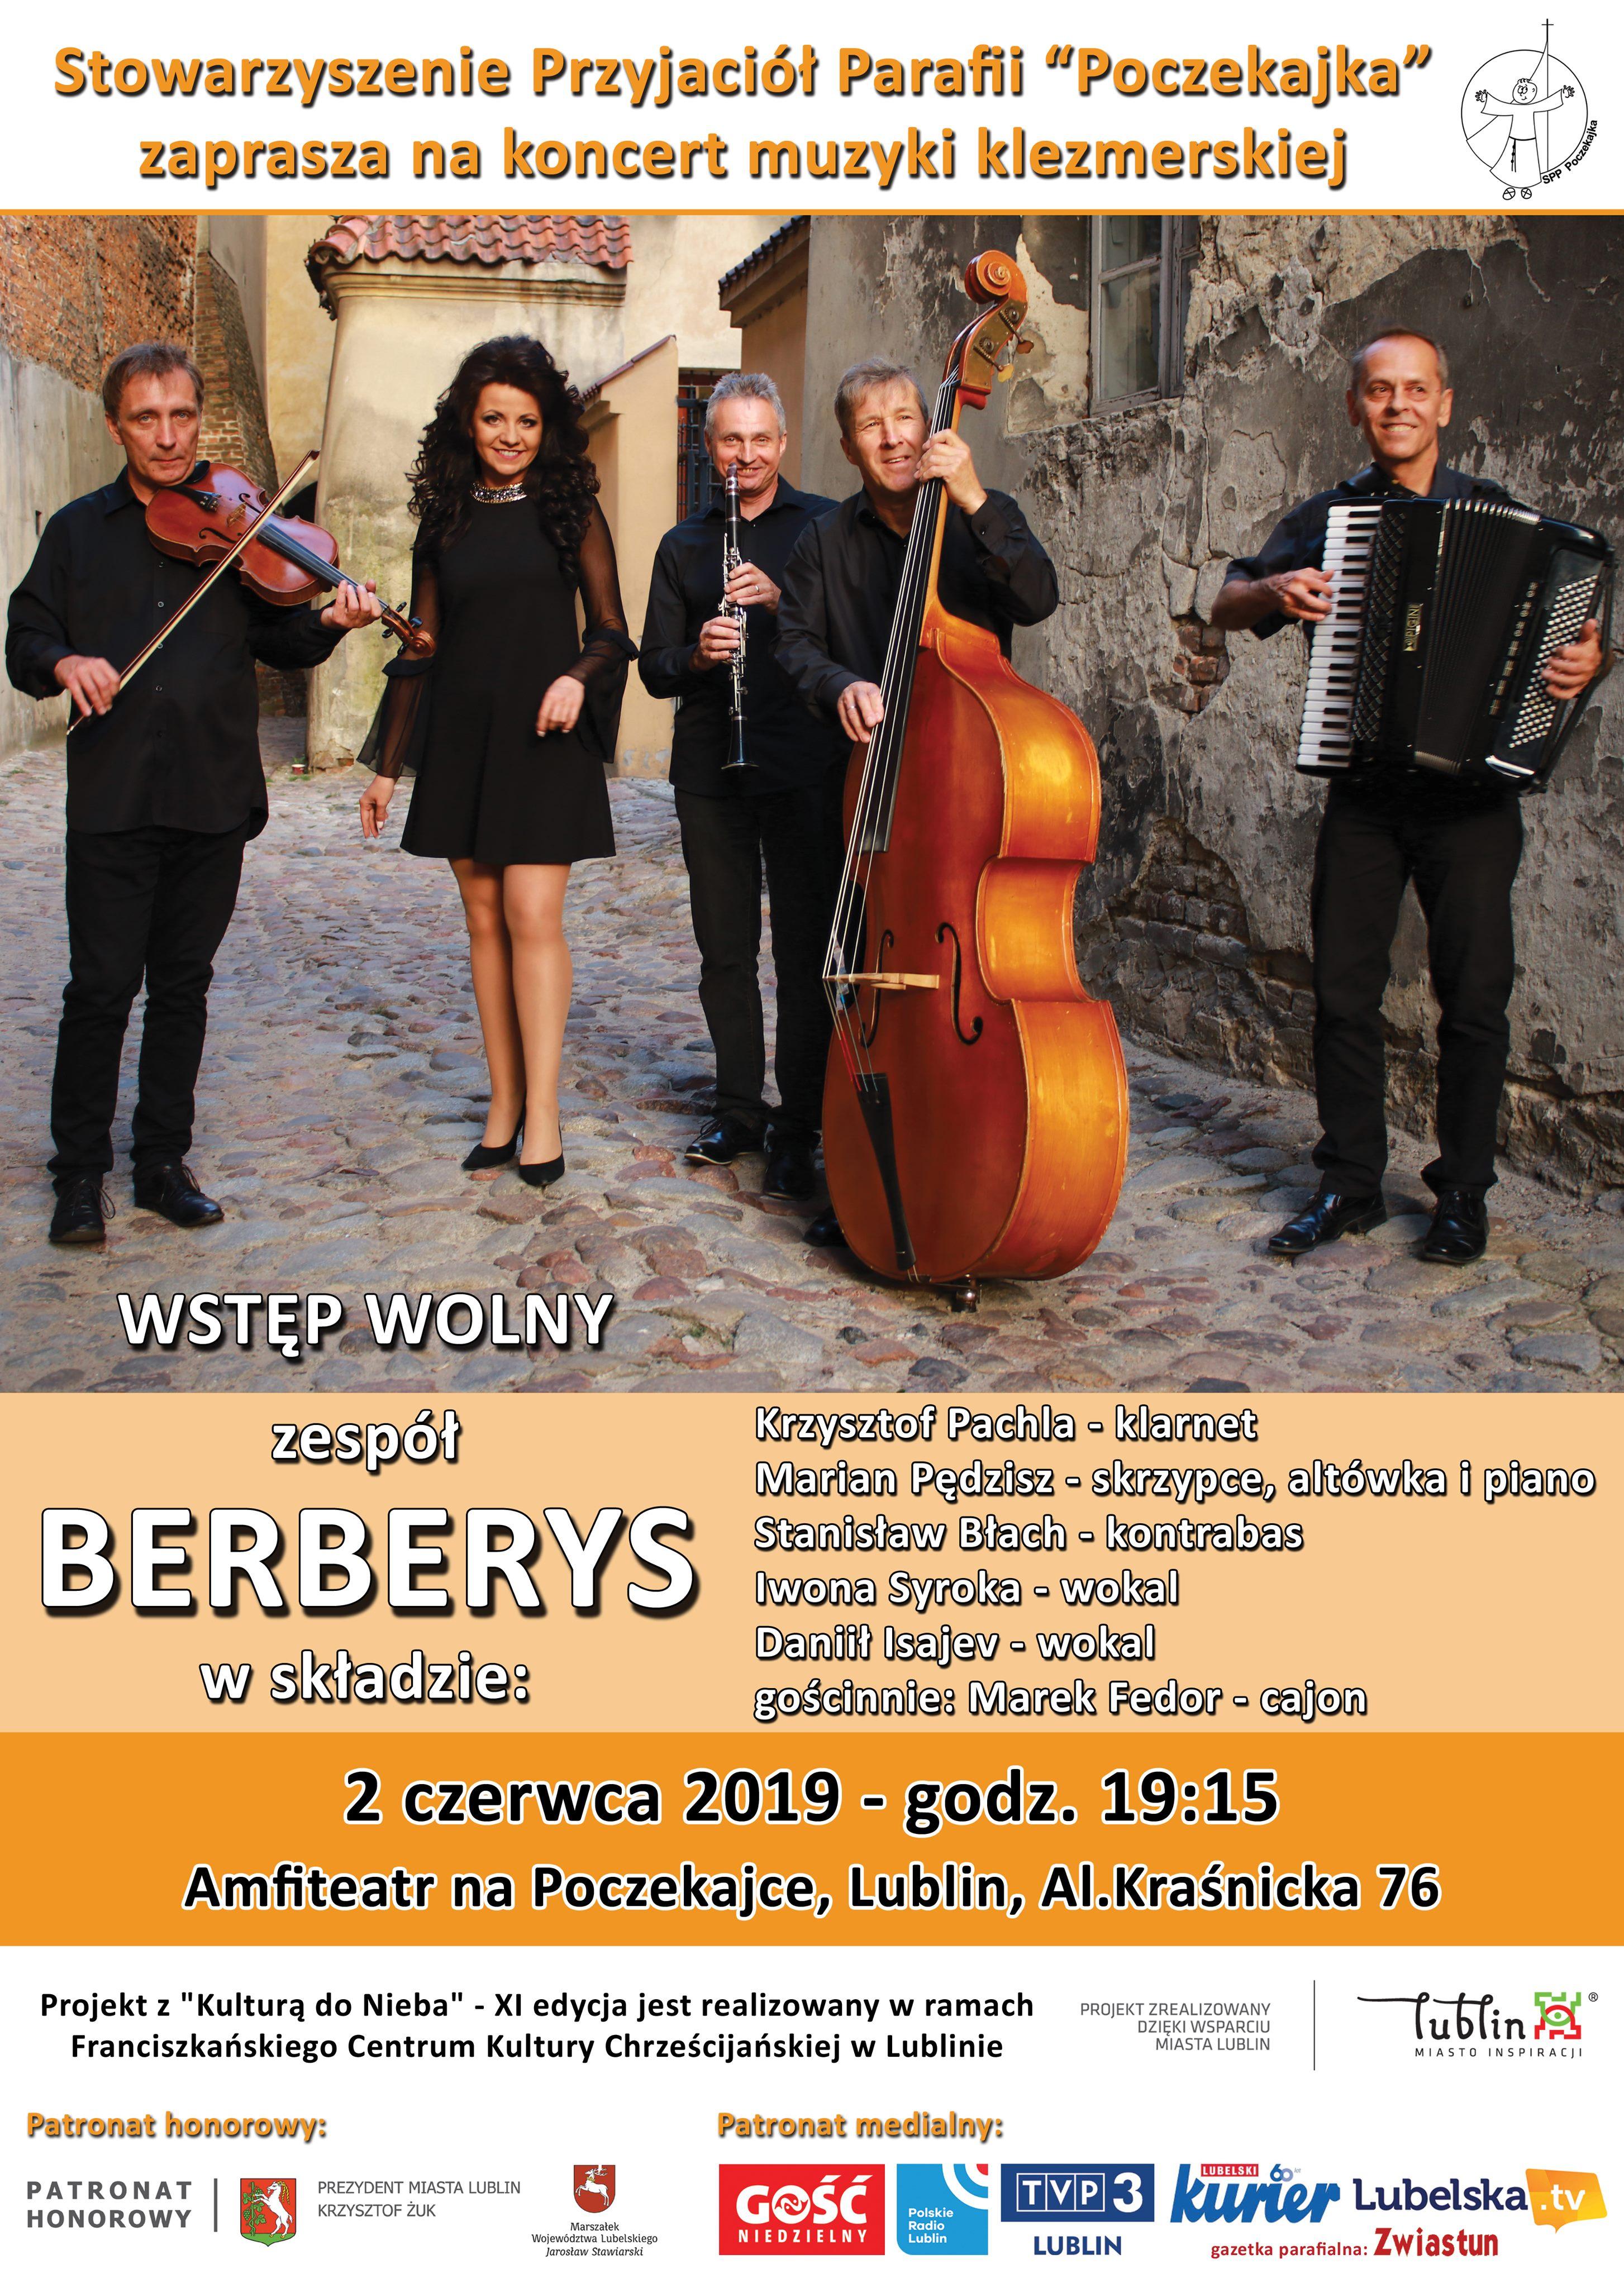 Koncert Zespołu Berberys